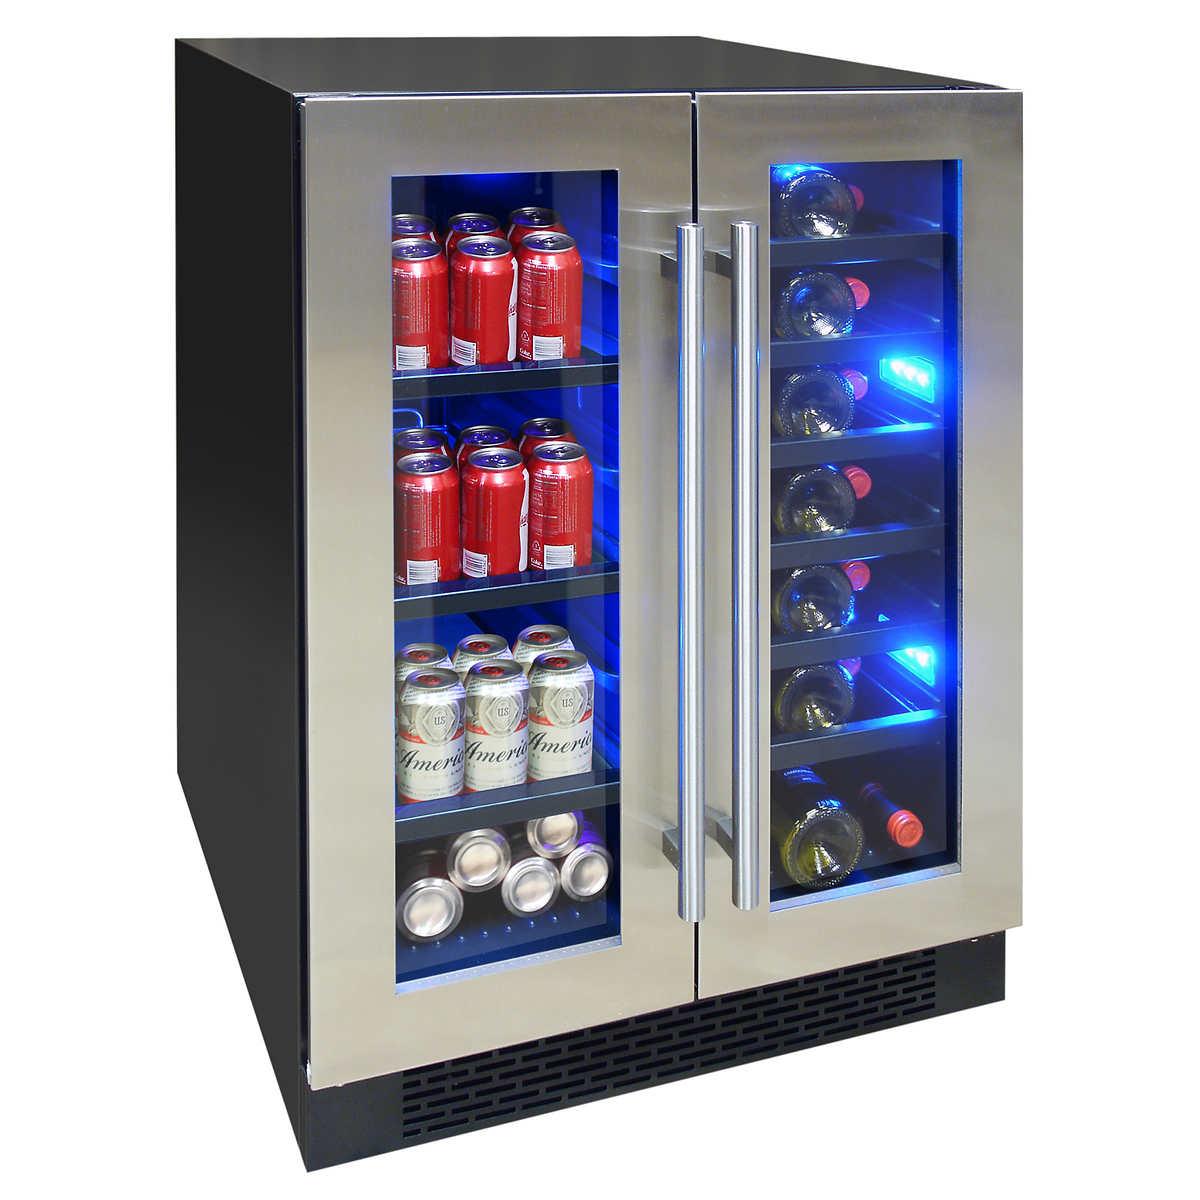 Wine Coolers wine cellars & coolers | costco